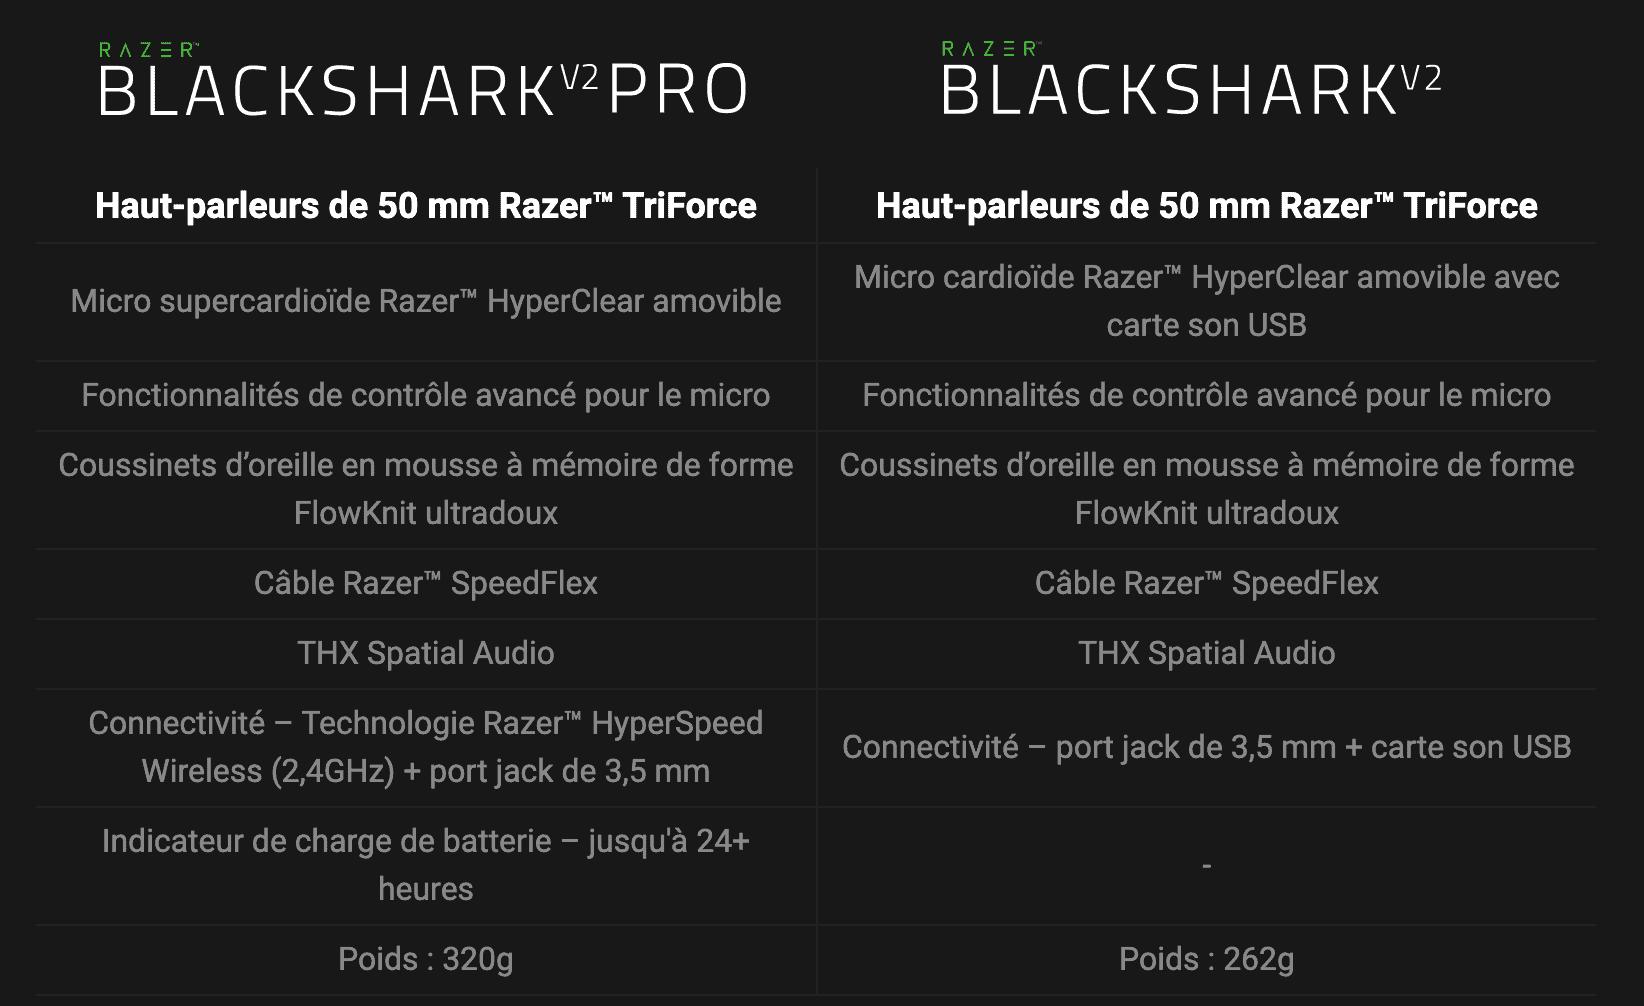 Les modèles PRO et normal du Razer BlackShark V2